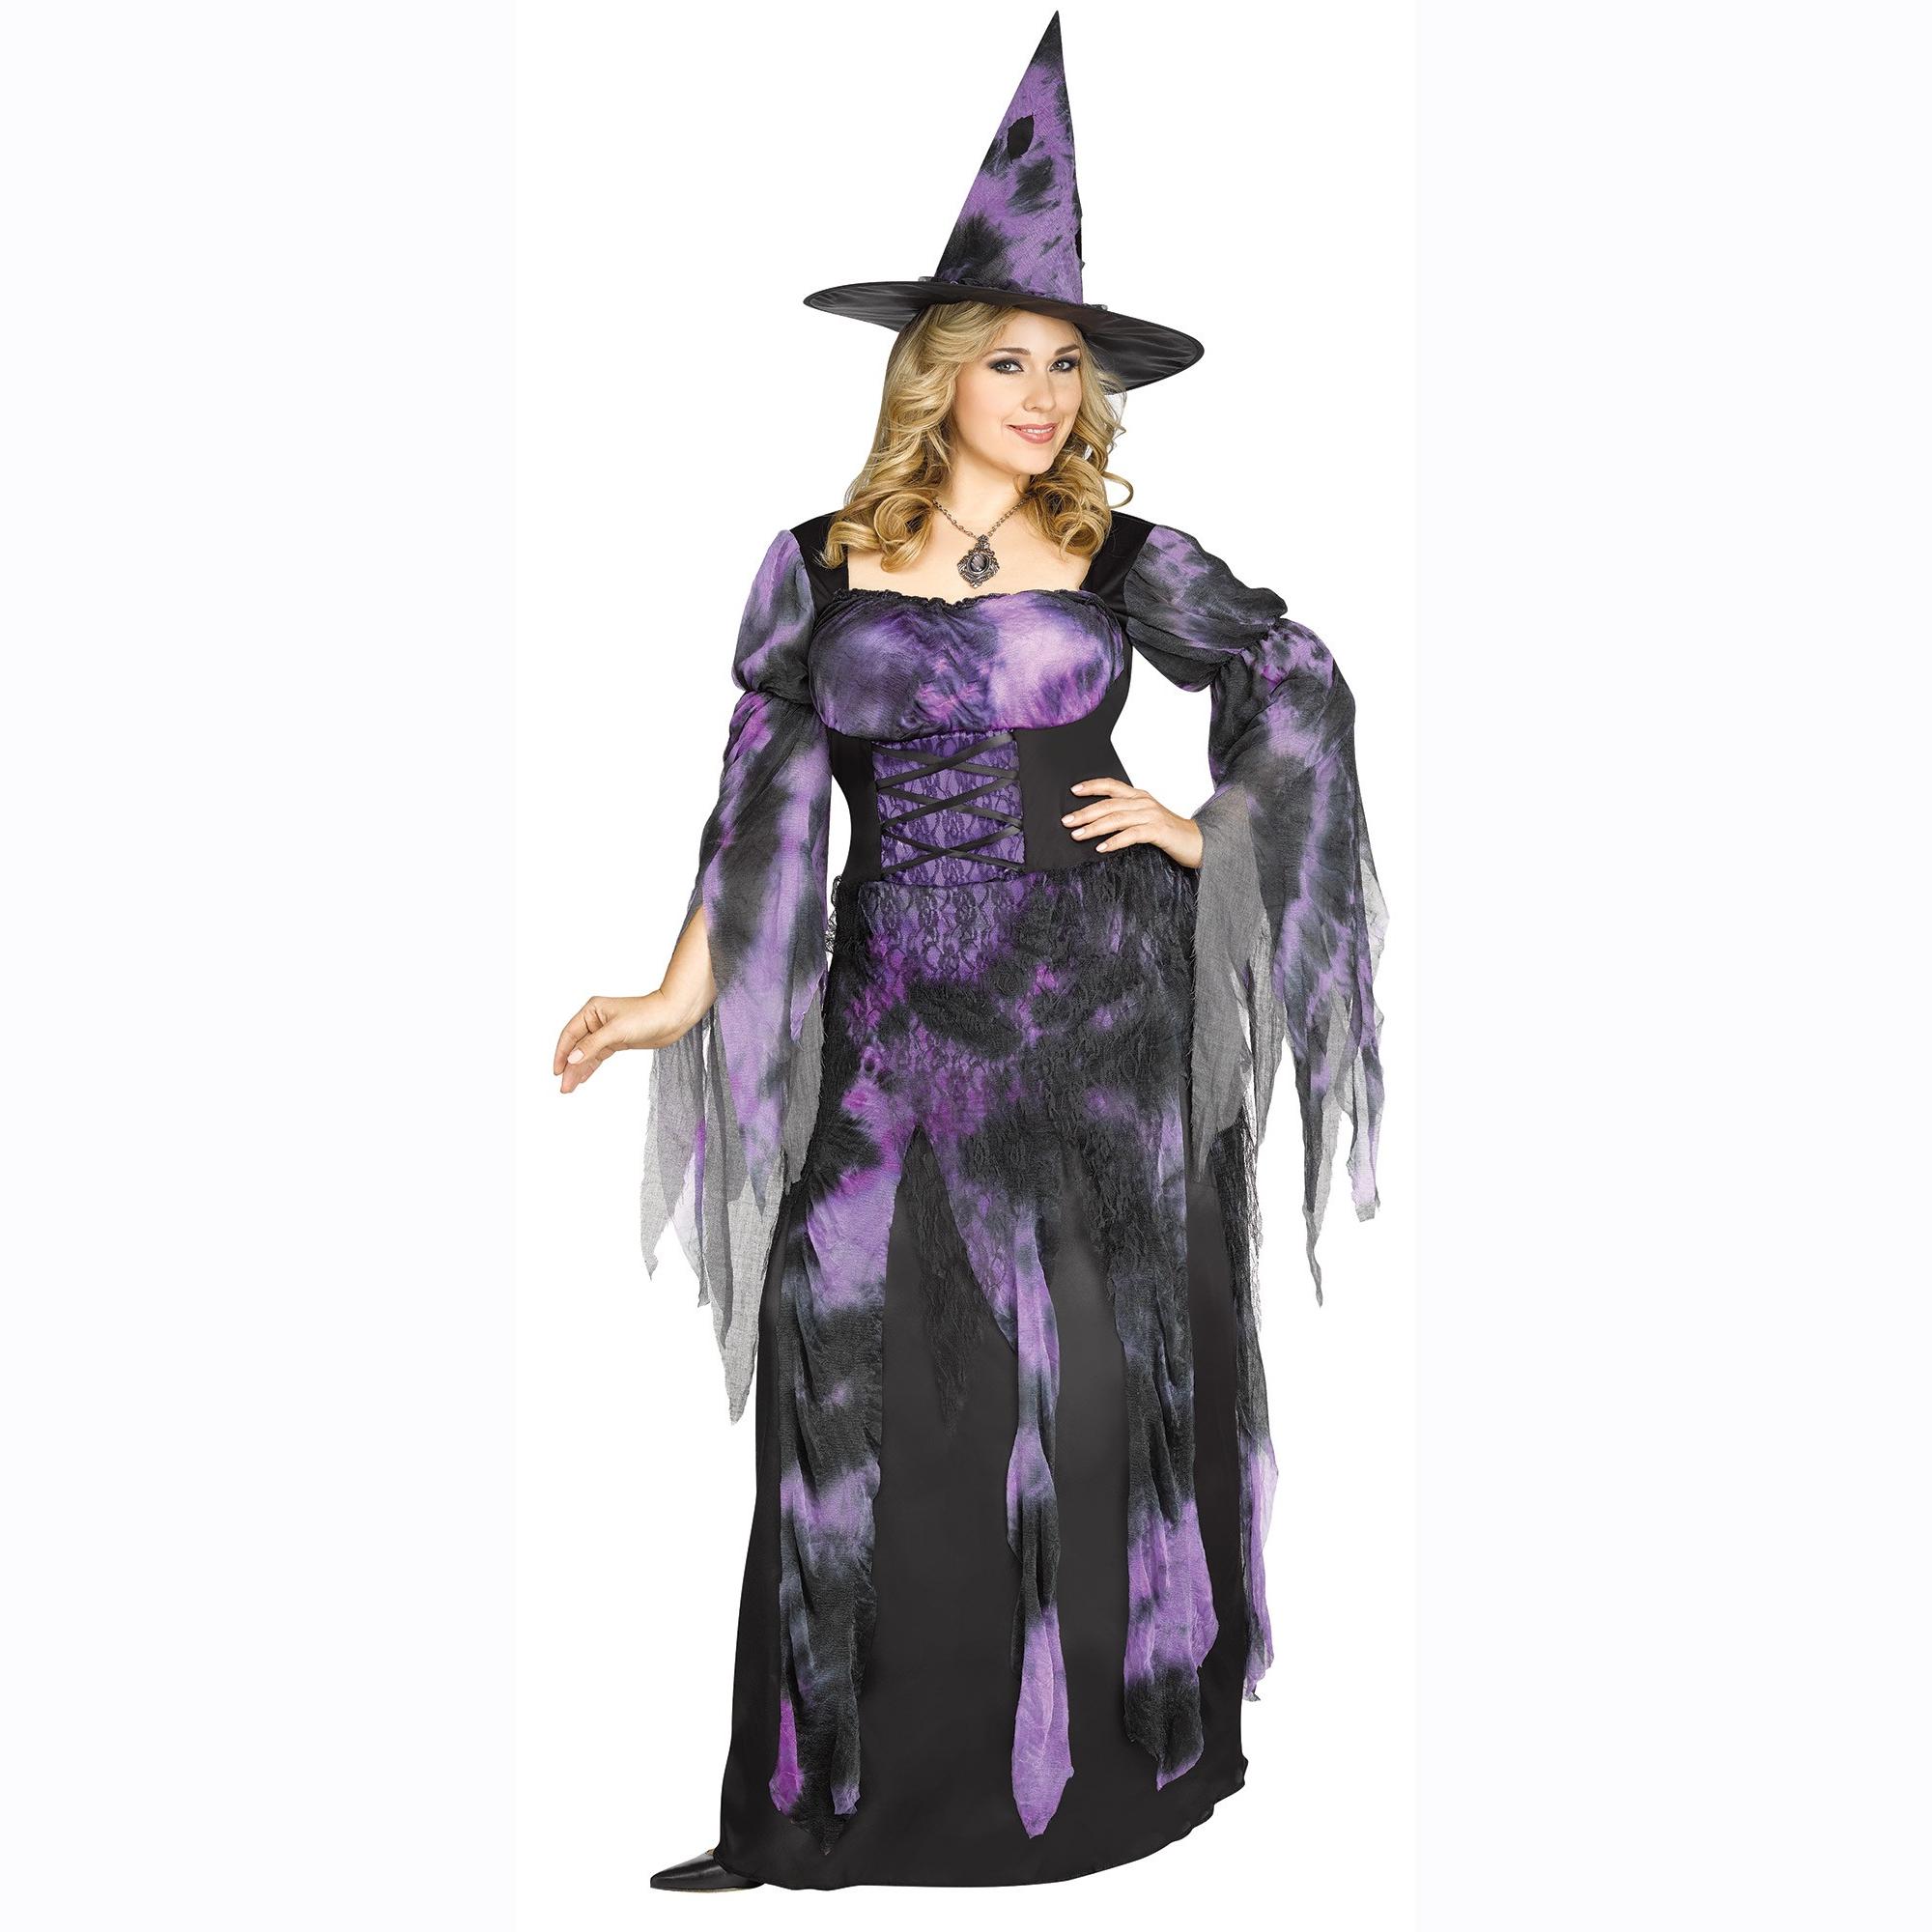 Buy Starlight Witch Halloween Costume - Cappel's